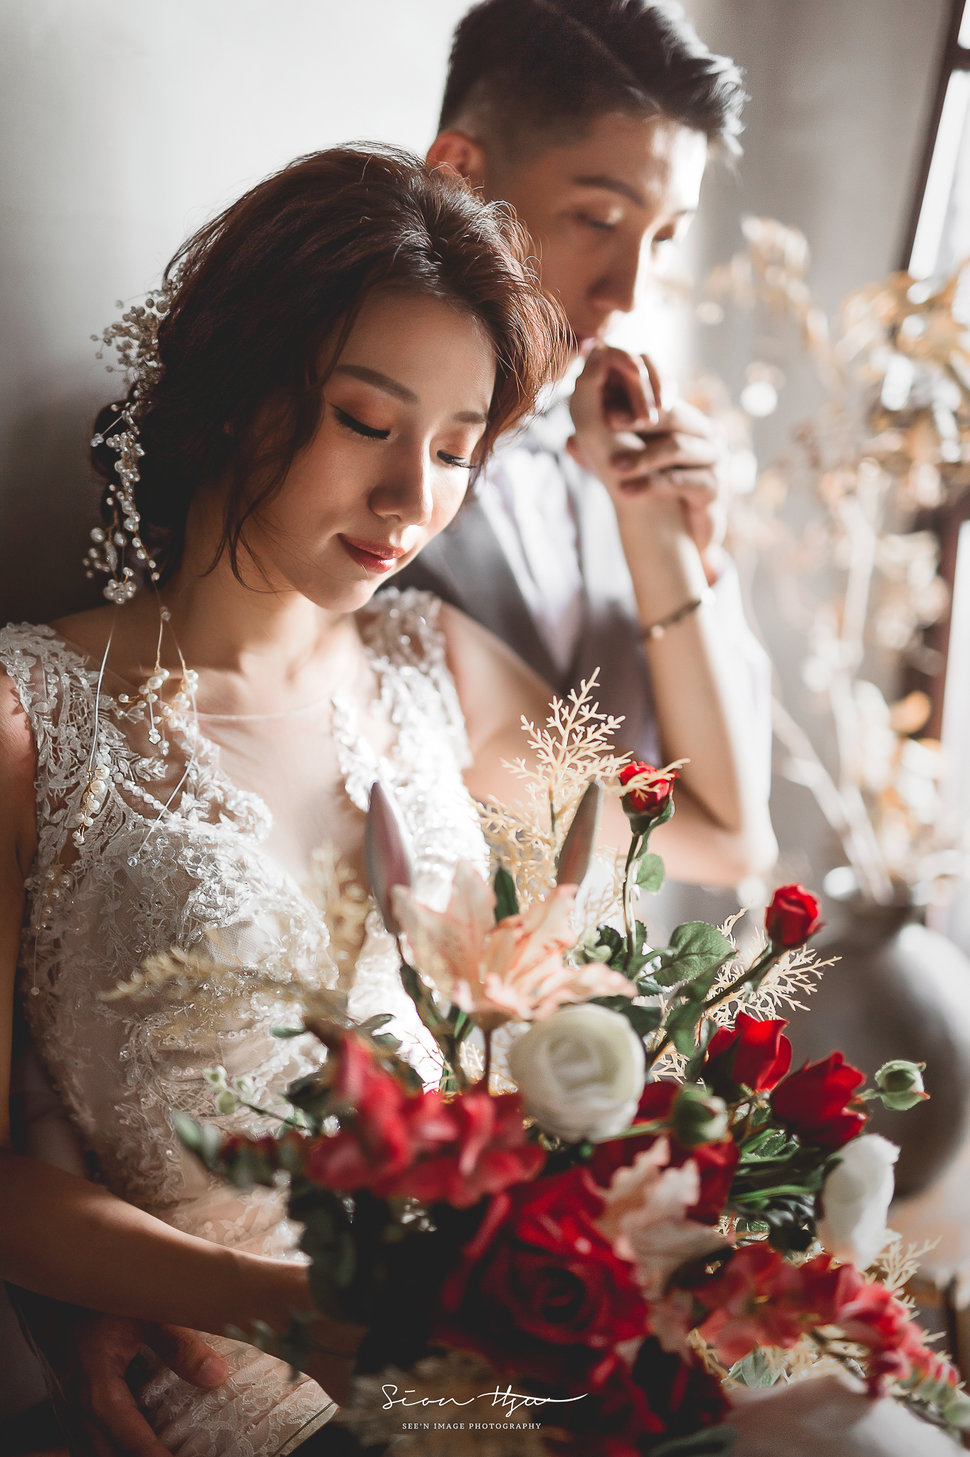 SEN_1197-編輯 - ABOUT PHOTO《結婚吧》